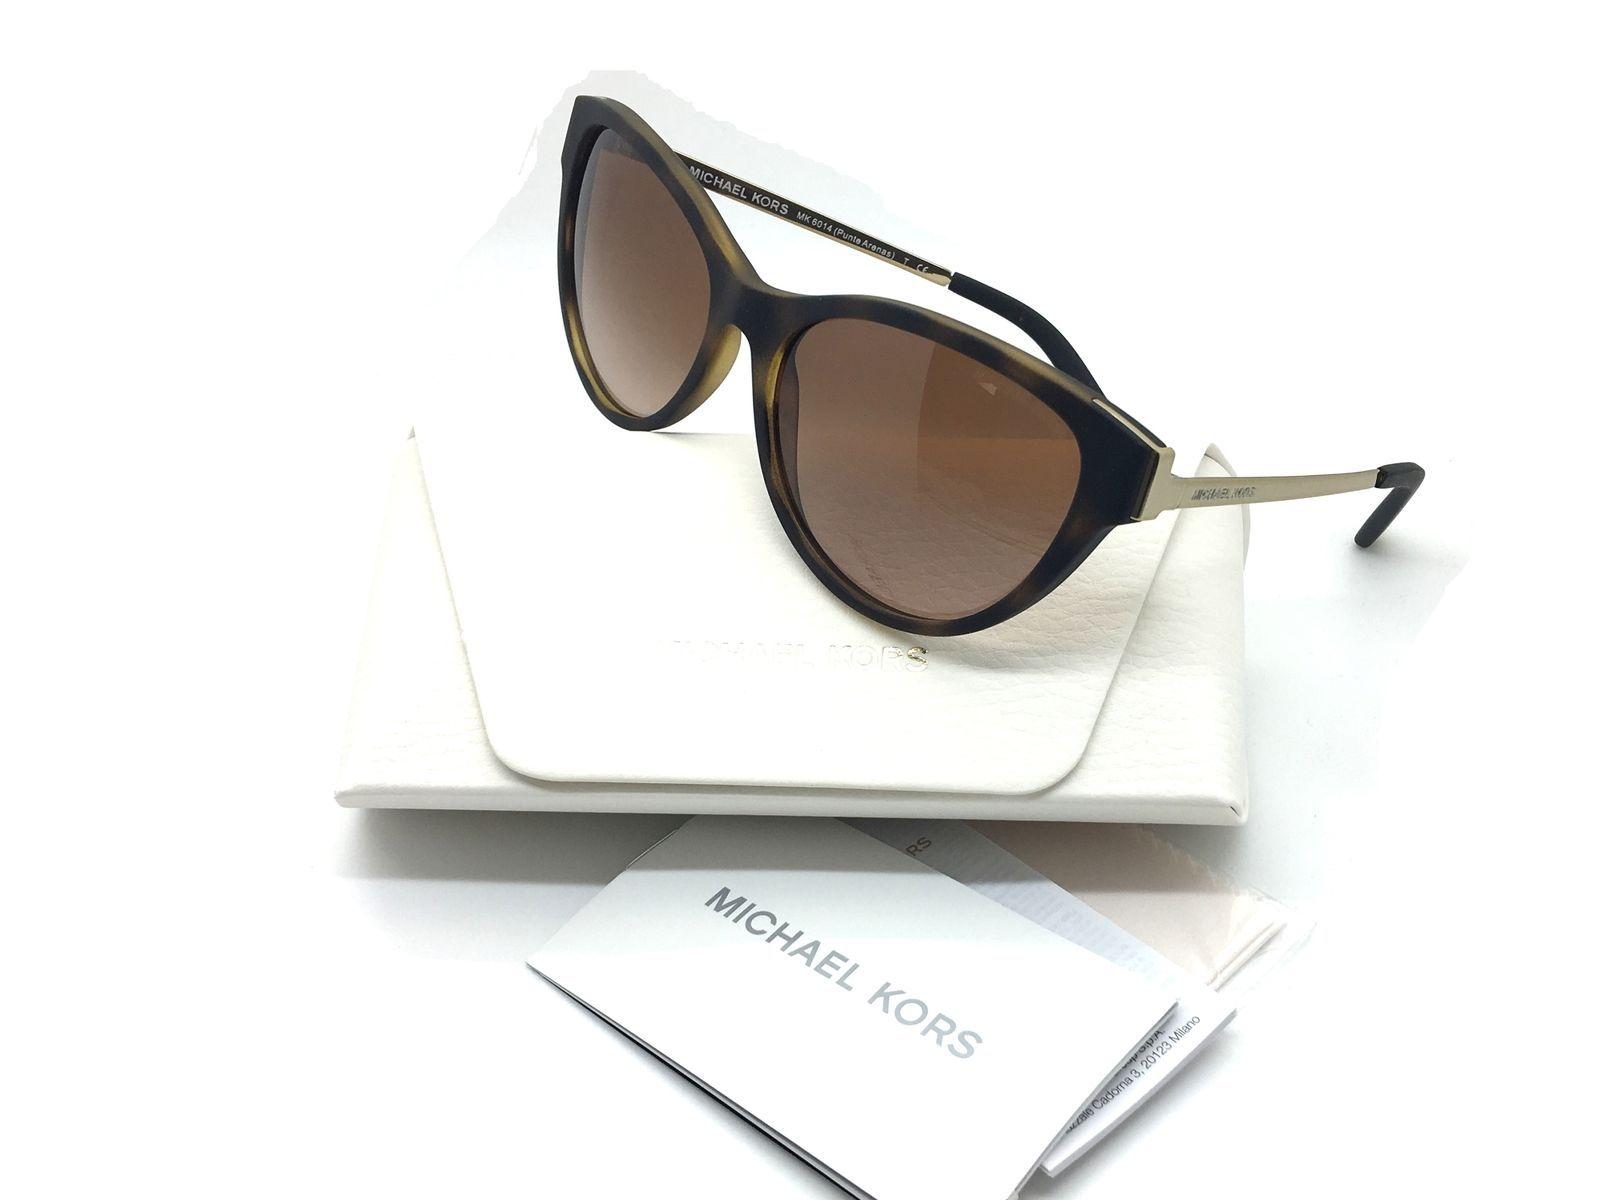 65f157c64fb2b Michael Kors Tortoise Sunglasses MK 6014 and 50 similar items. S l1600